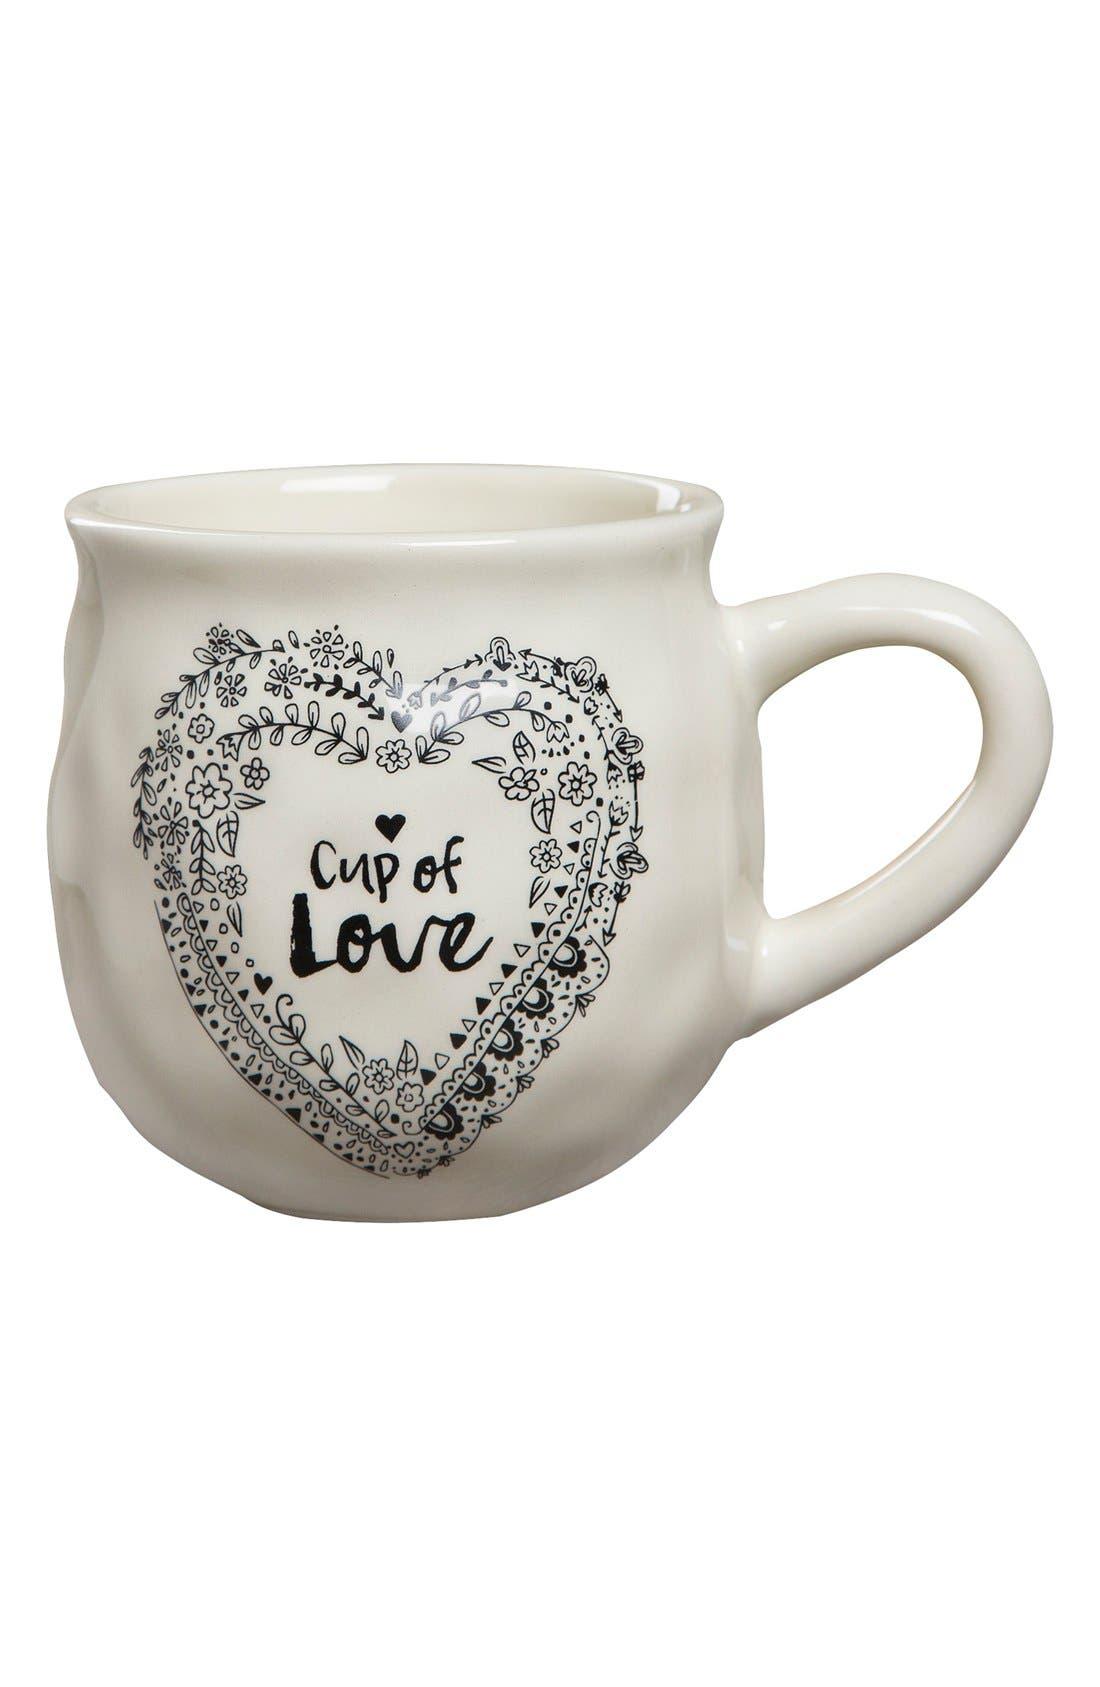 'Happy Mug - Cup of Love' Ceramic Mug,                             Main thumbnail 1, color,                             900